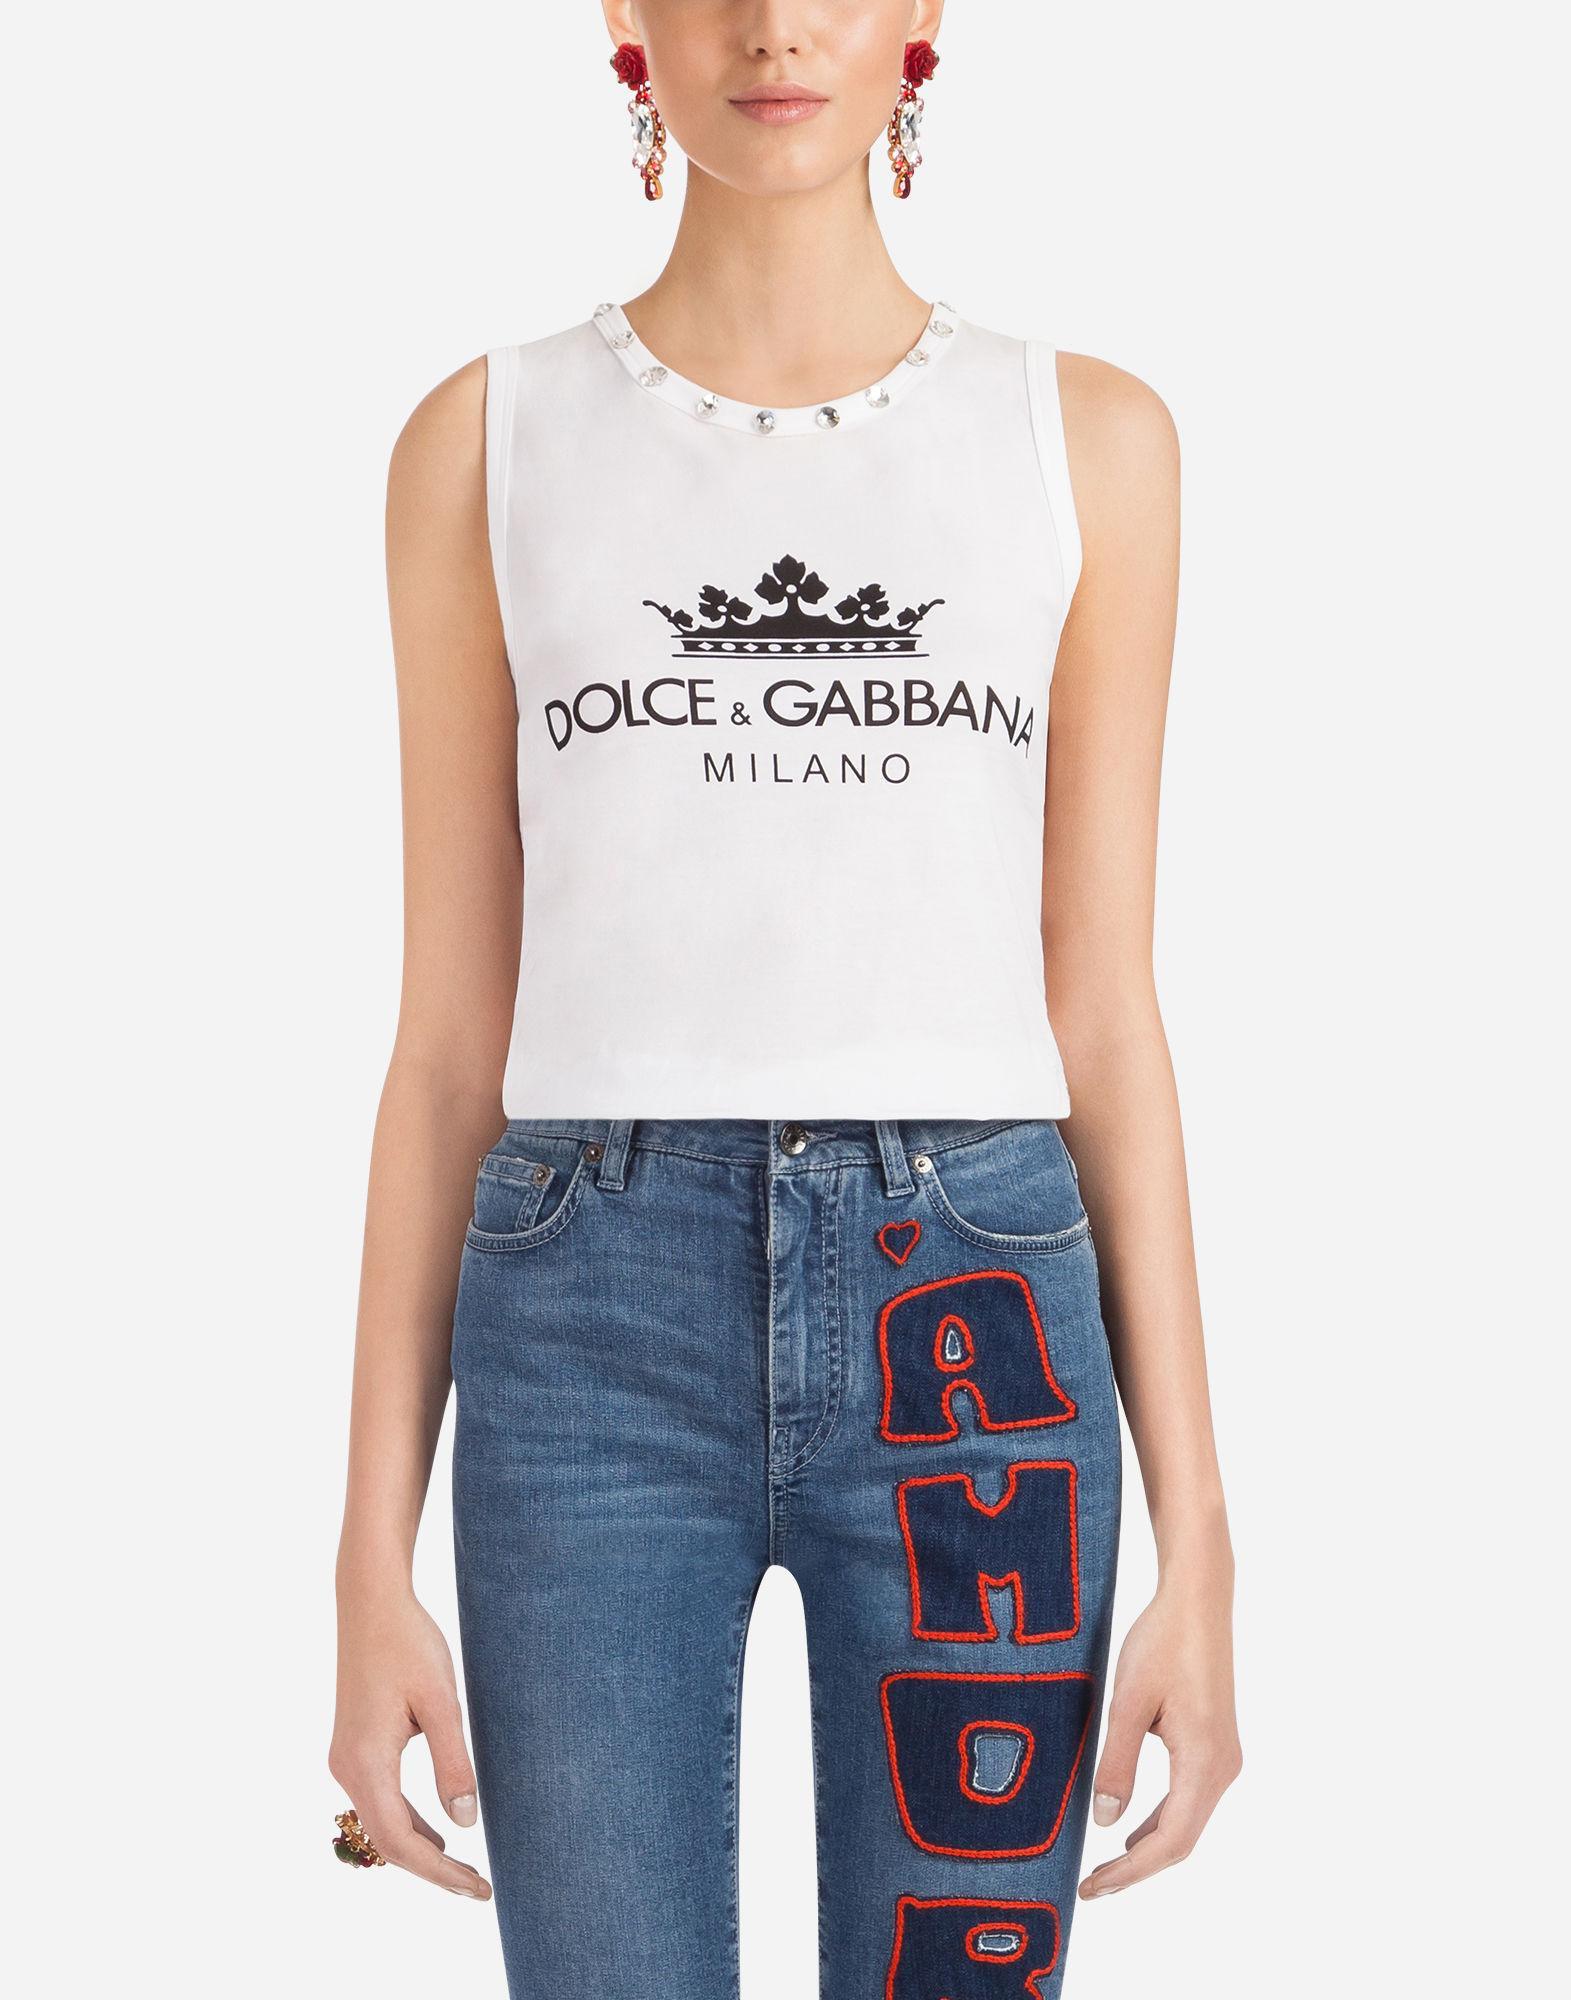 Dolce & Gabbana Sleeveless Cotton T-Shirt In White